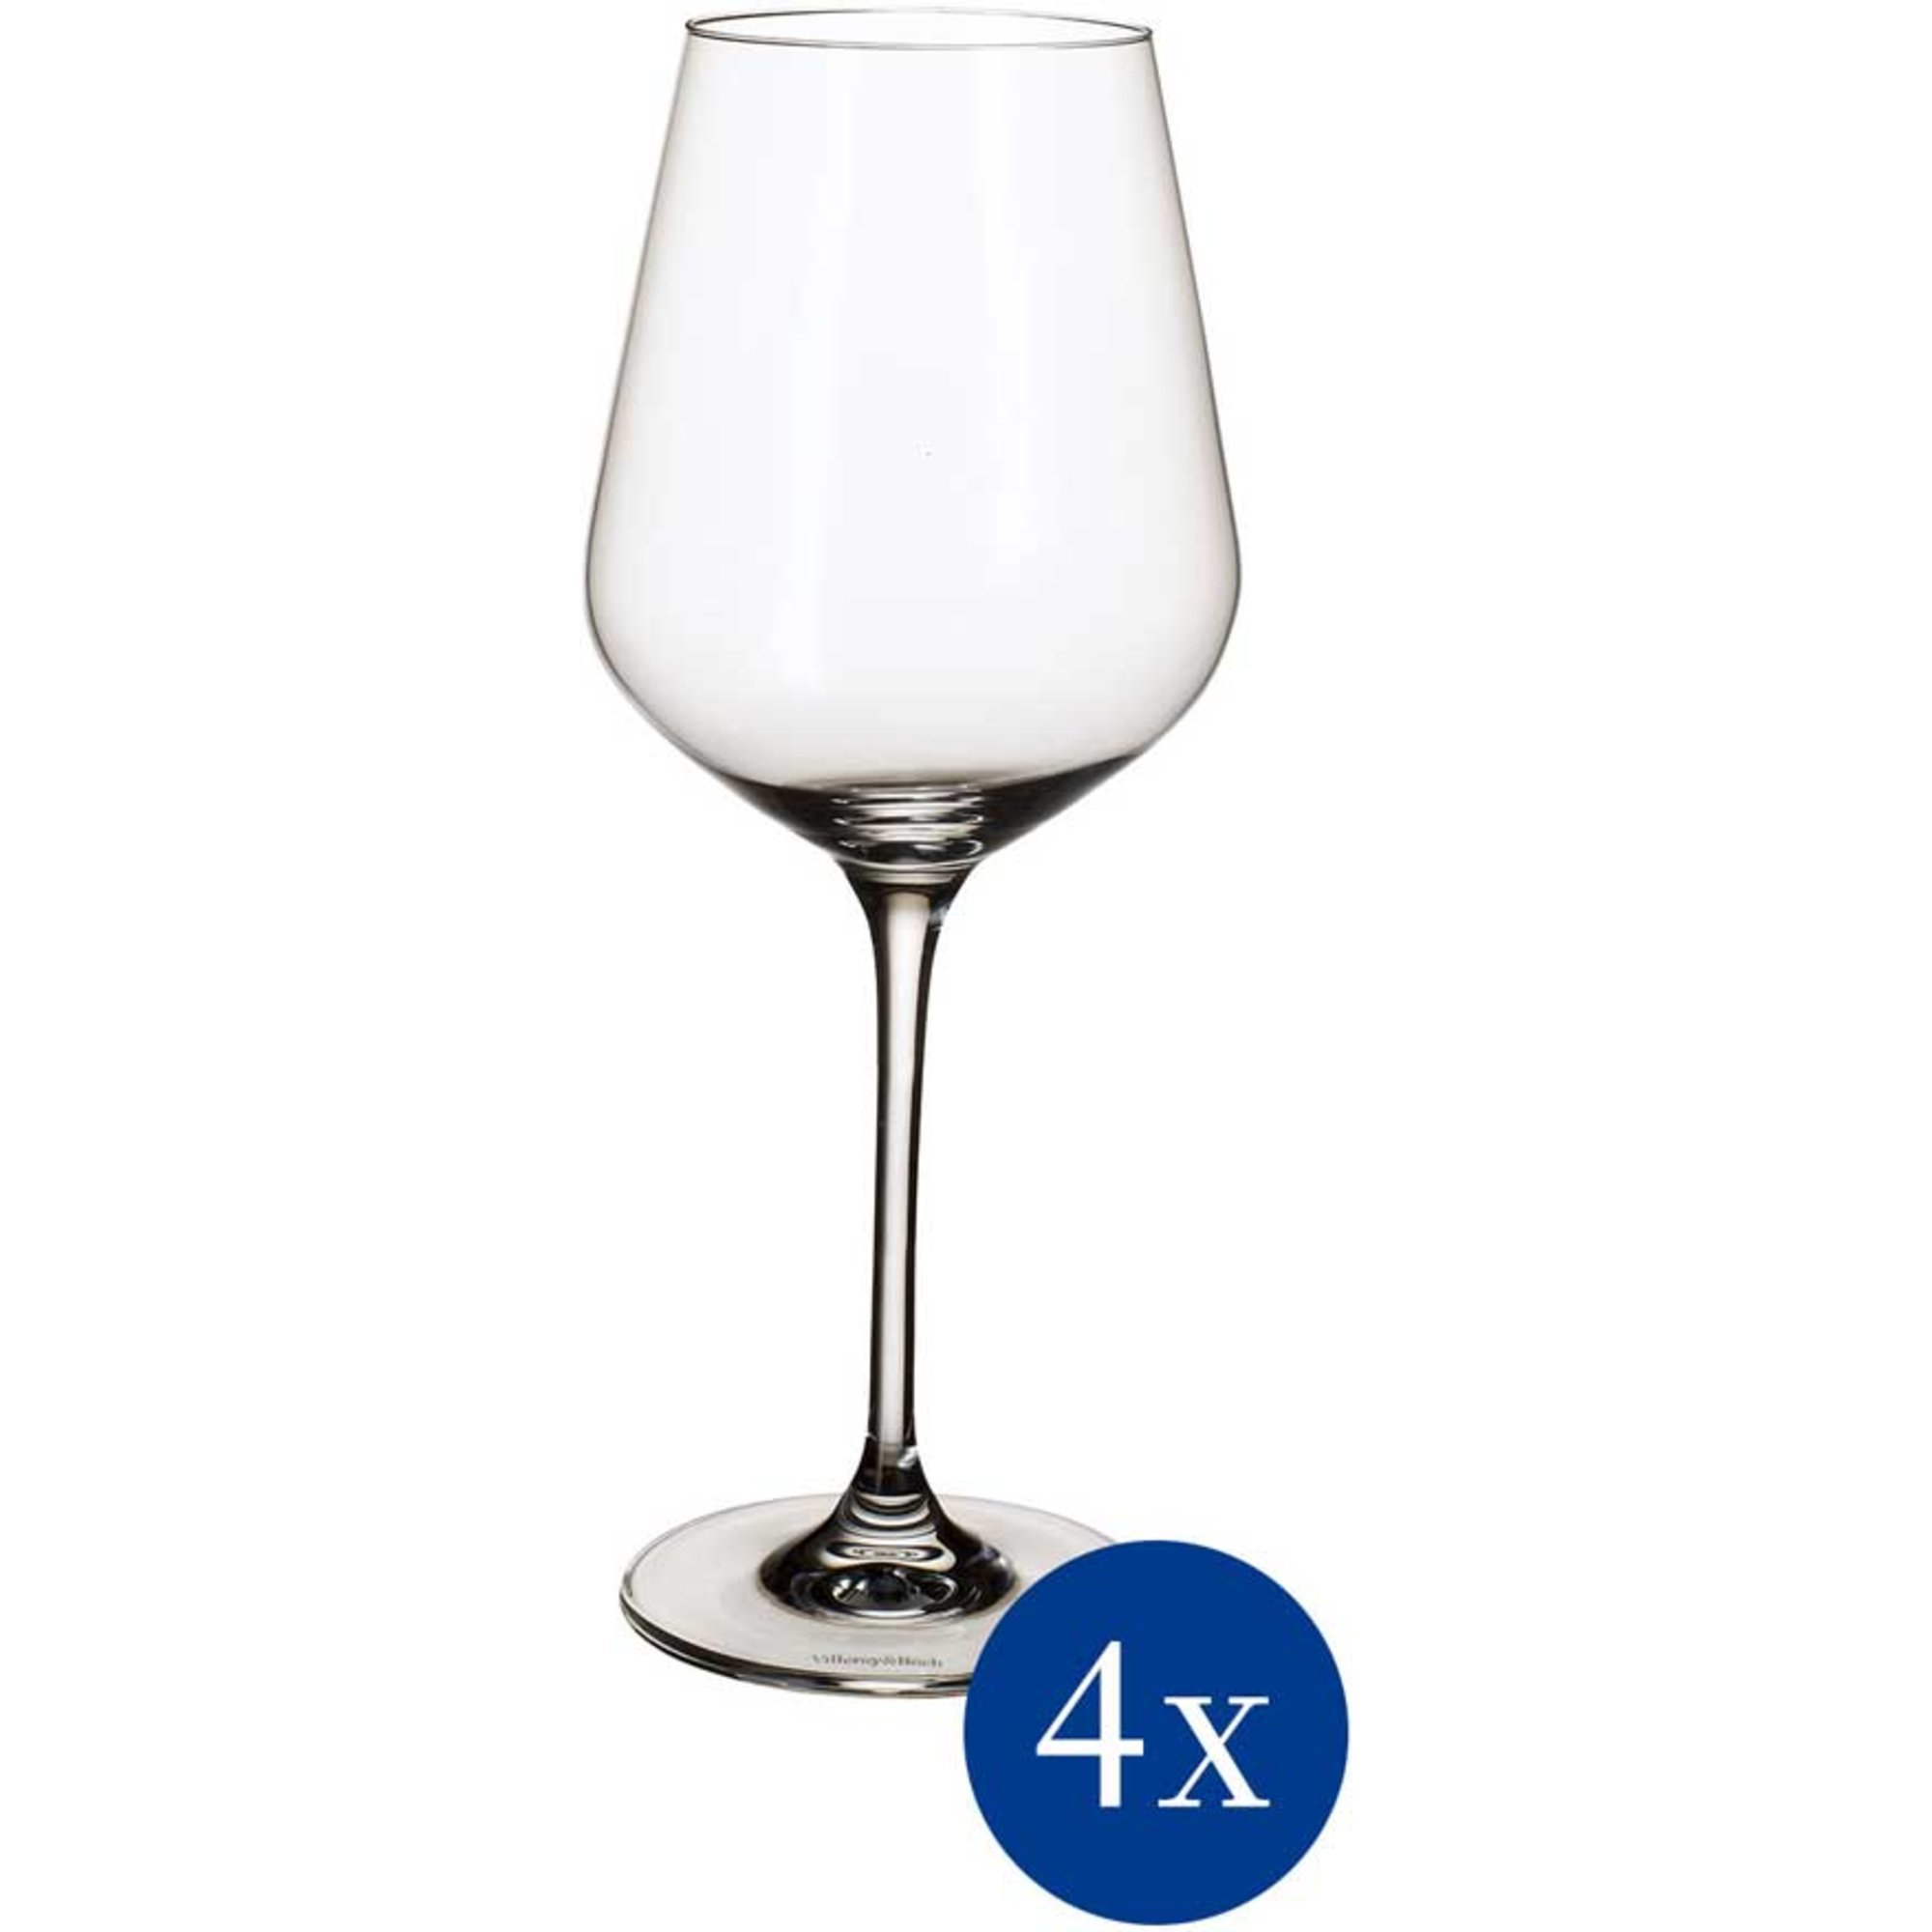 Villeroy & Boch La Divina Bordeauxglas 4-pack